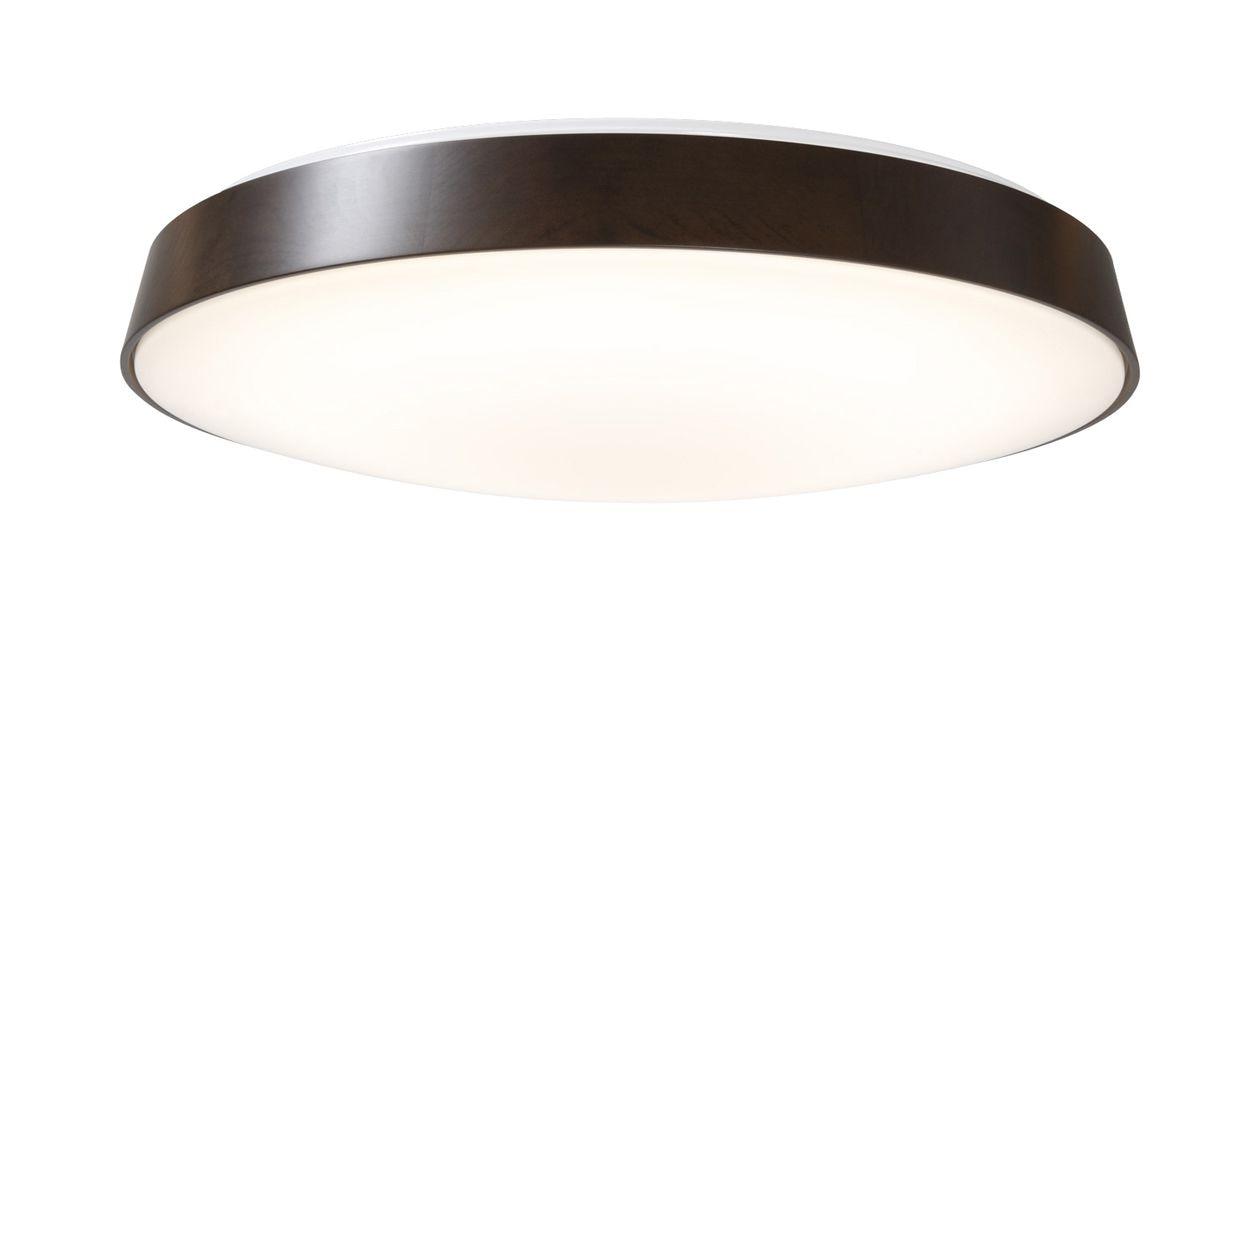 LED木製シーリングライト・調光調色機能付・ナチュラル ダークブラウン